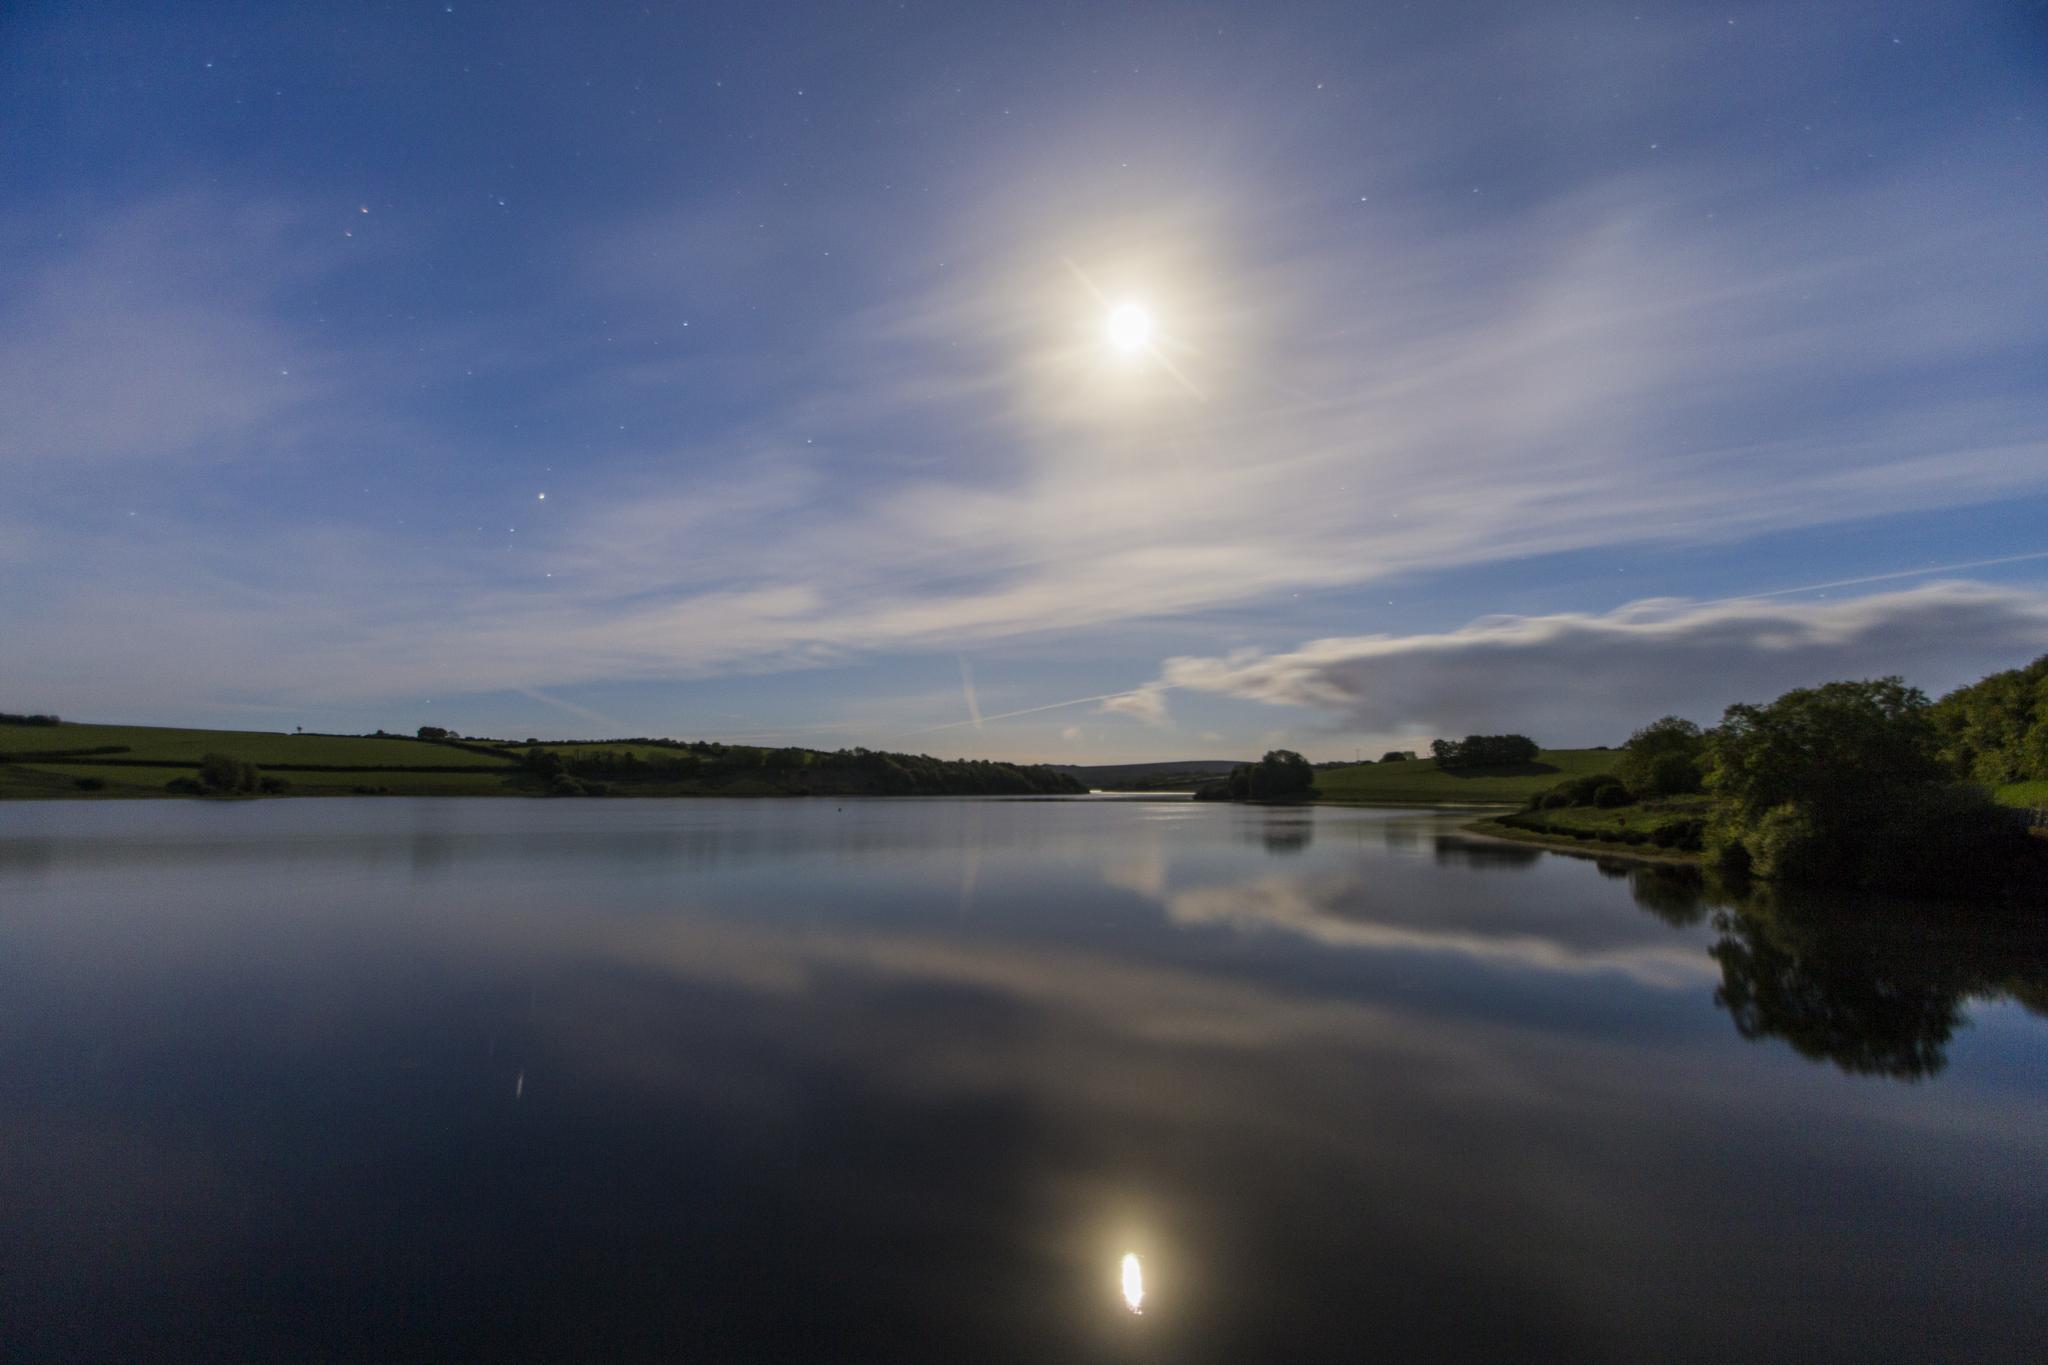 Moon River by metallipaul